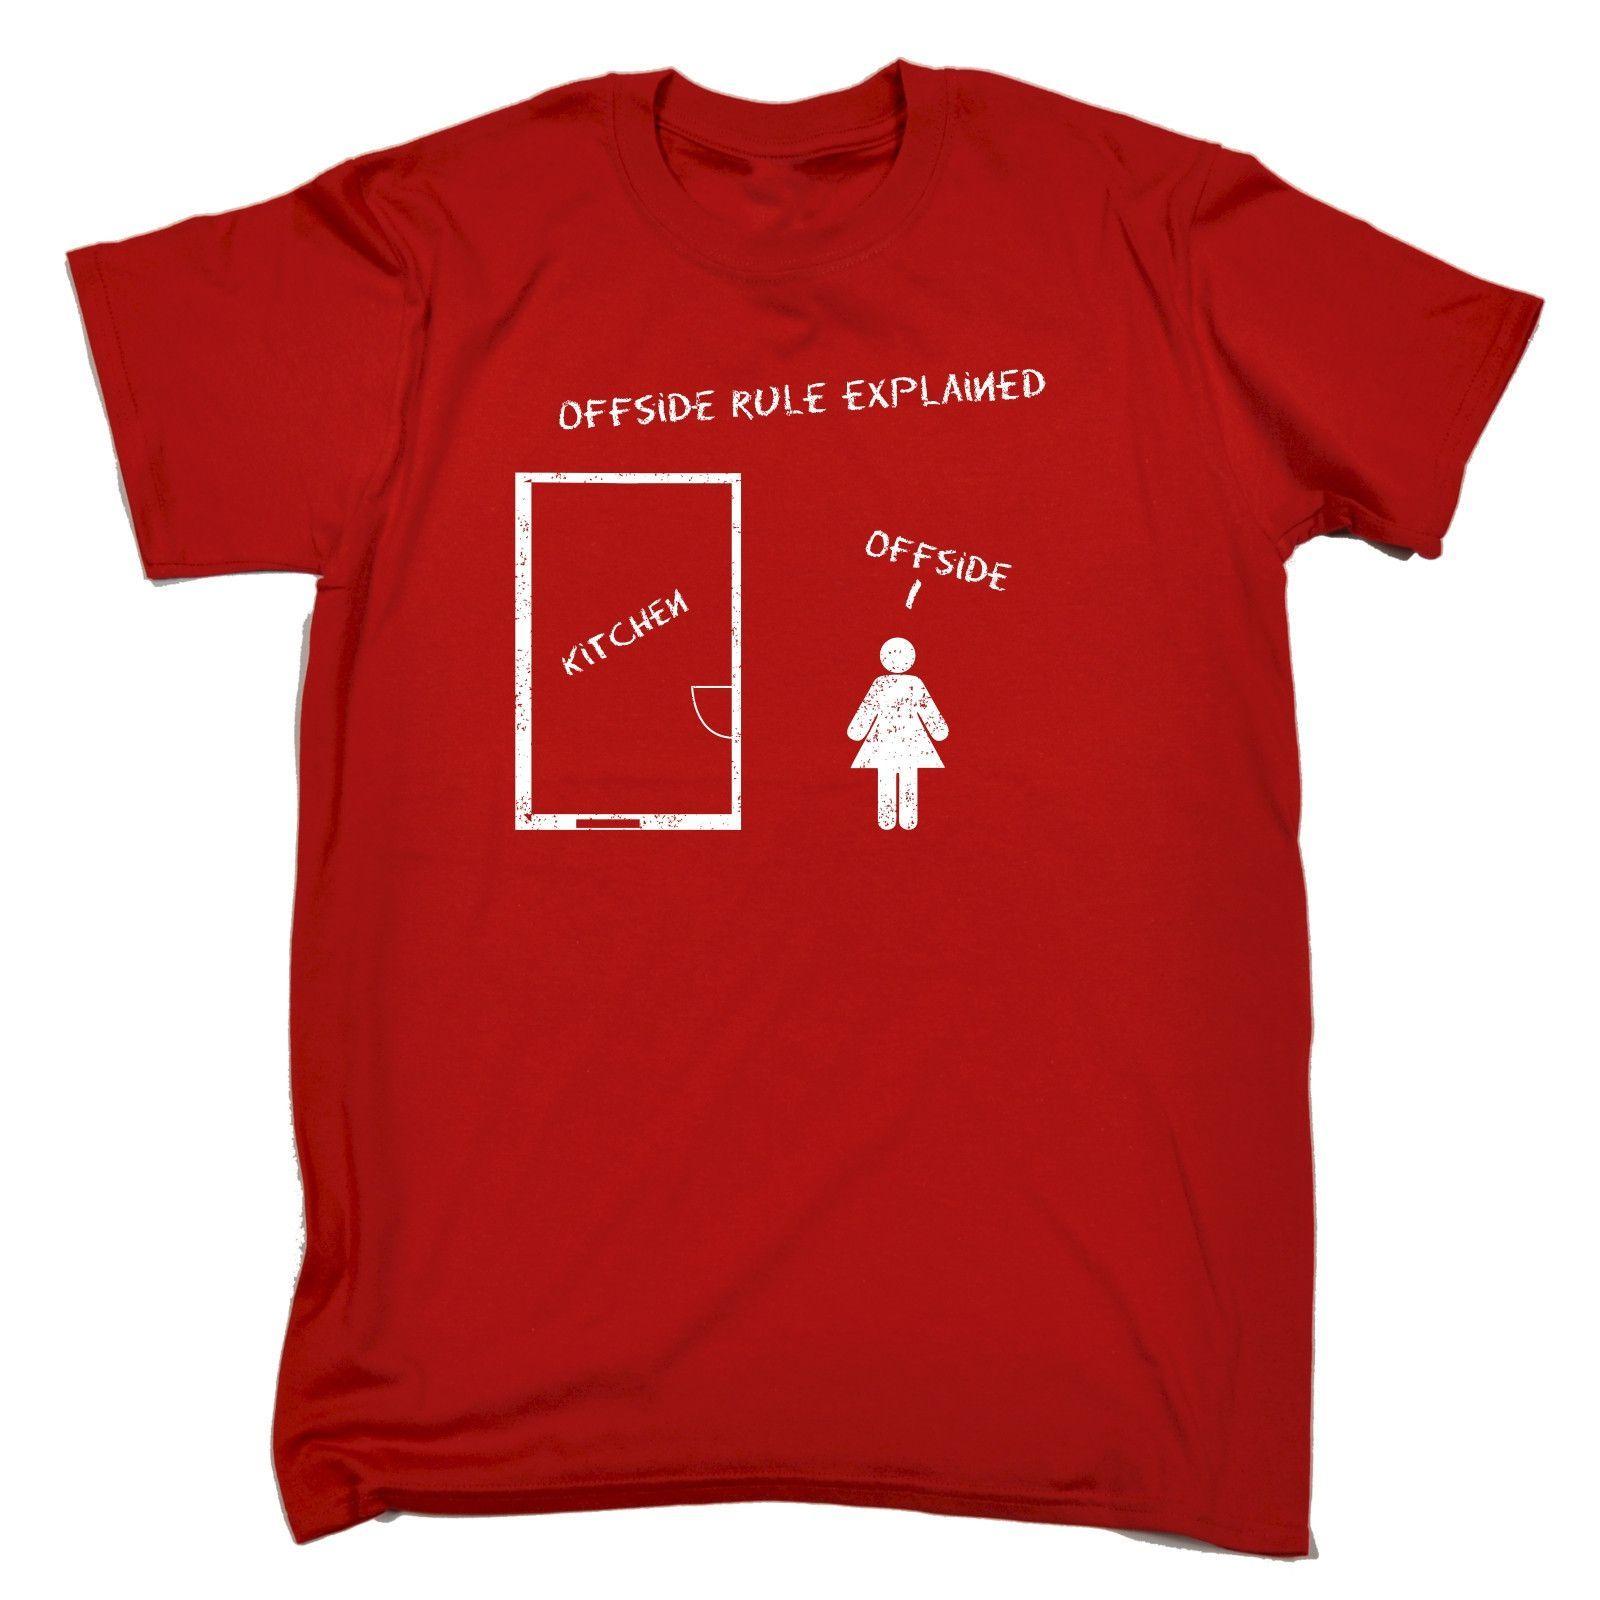 123t USA Men's Offside Rule Explained Kitchen Offside Funny T-Shirt